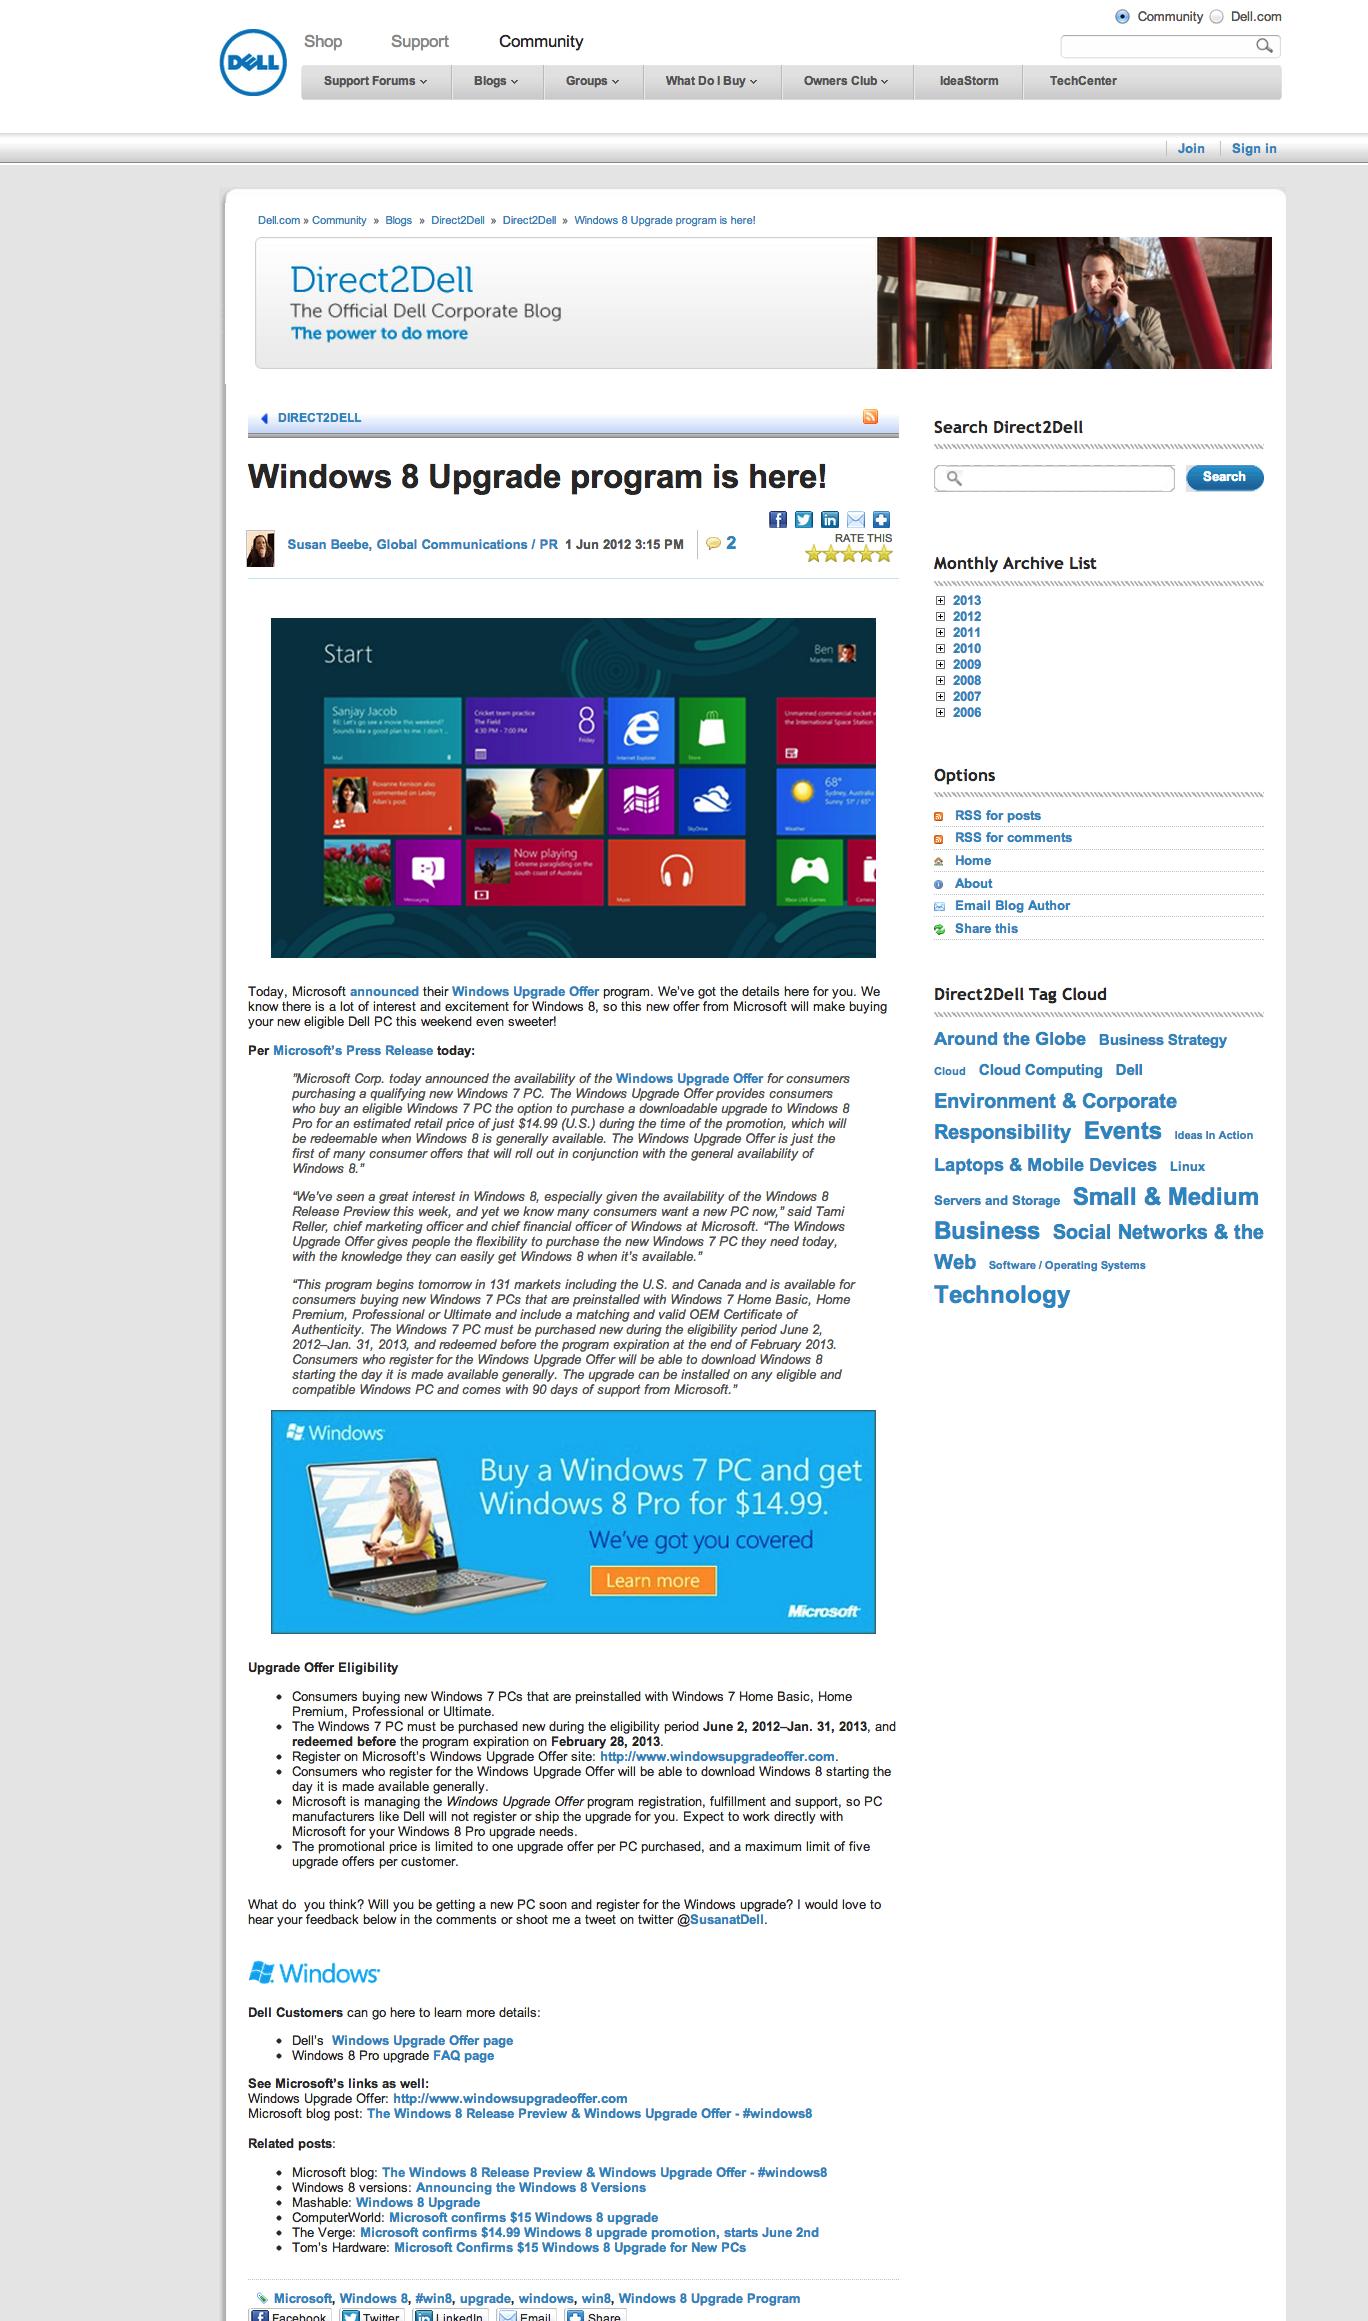 Windows 8 Upgrade program